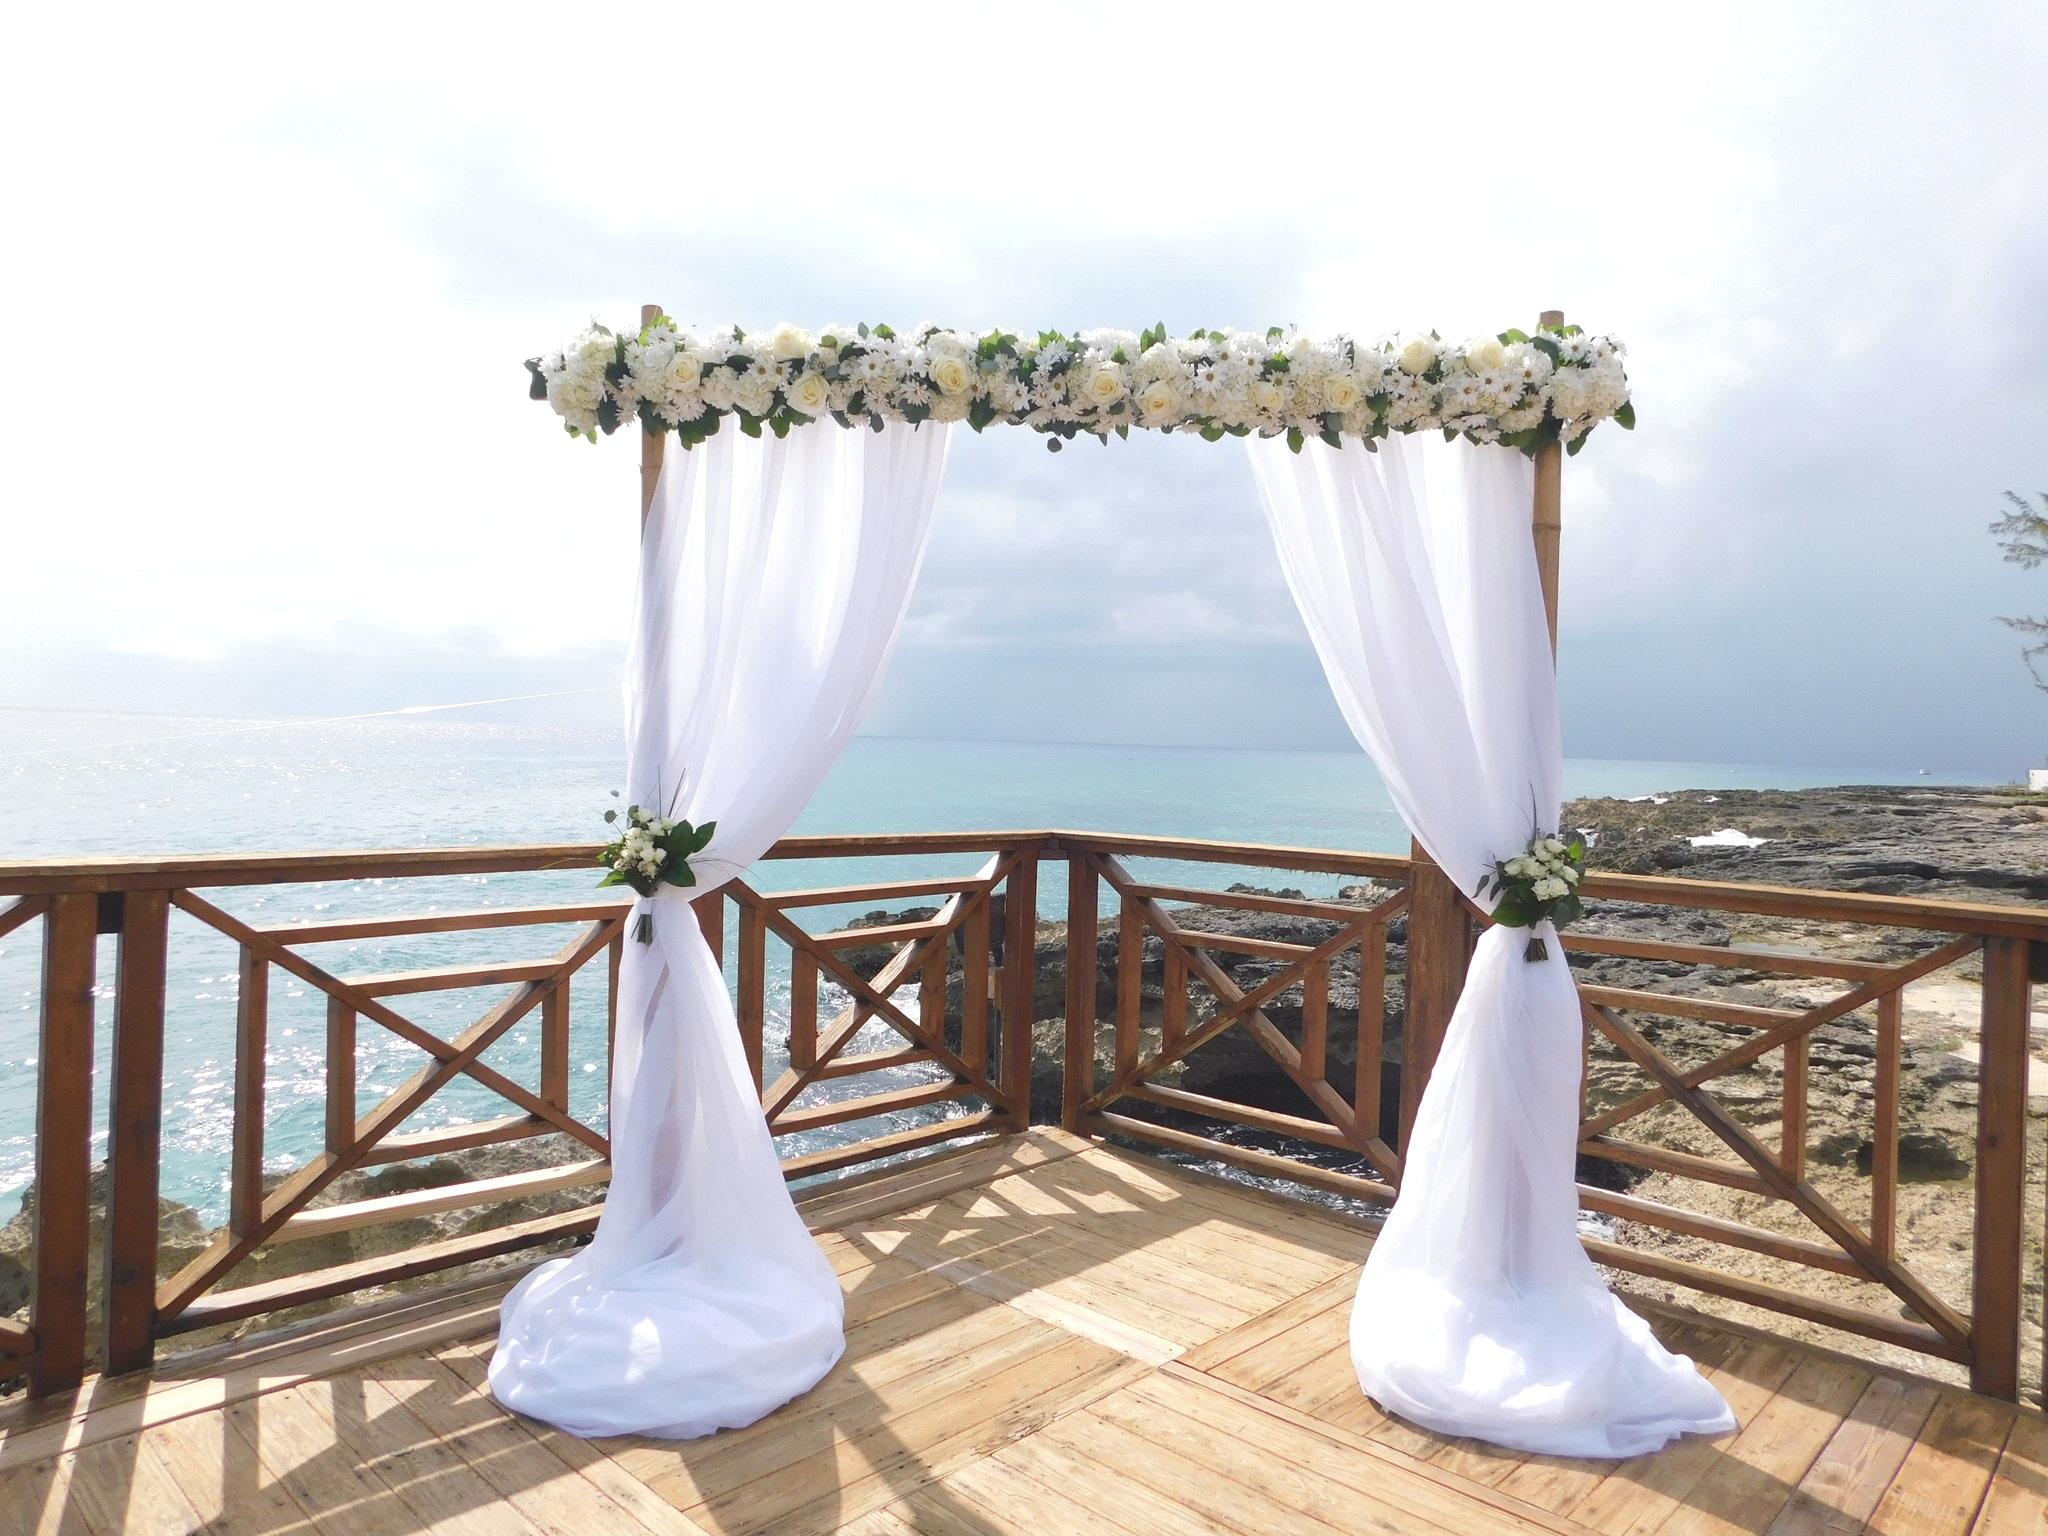 Ceremony-arch-curtain-floral.jpg